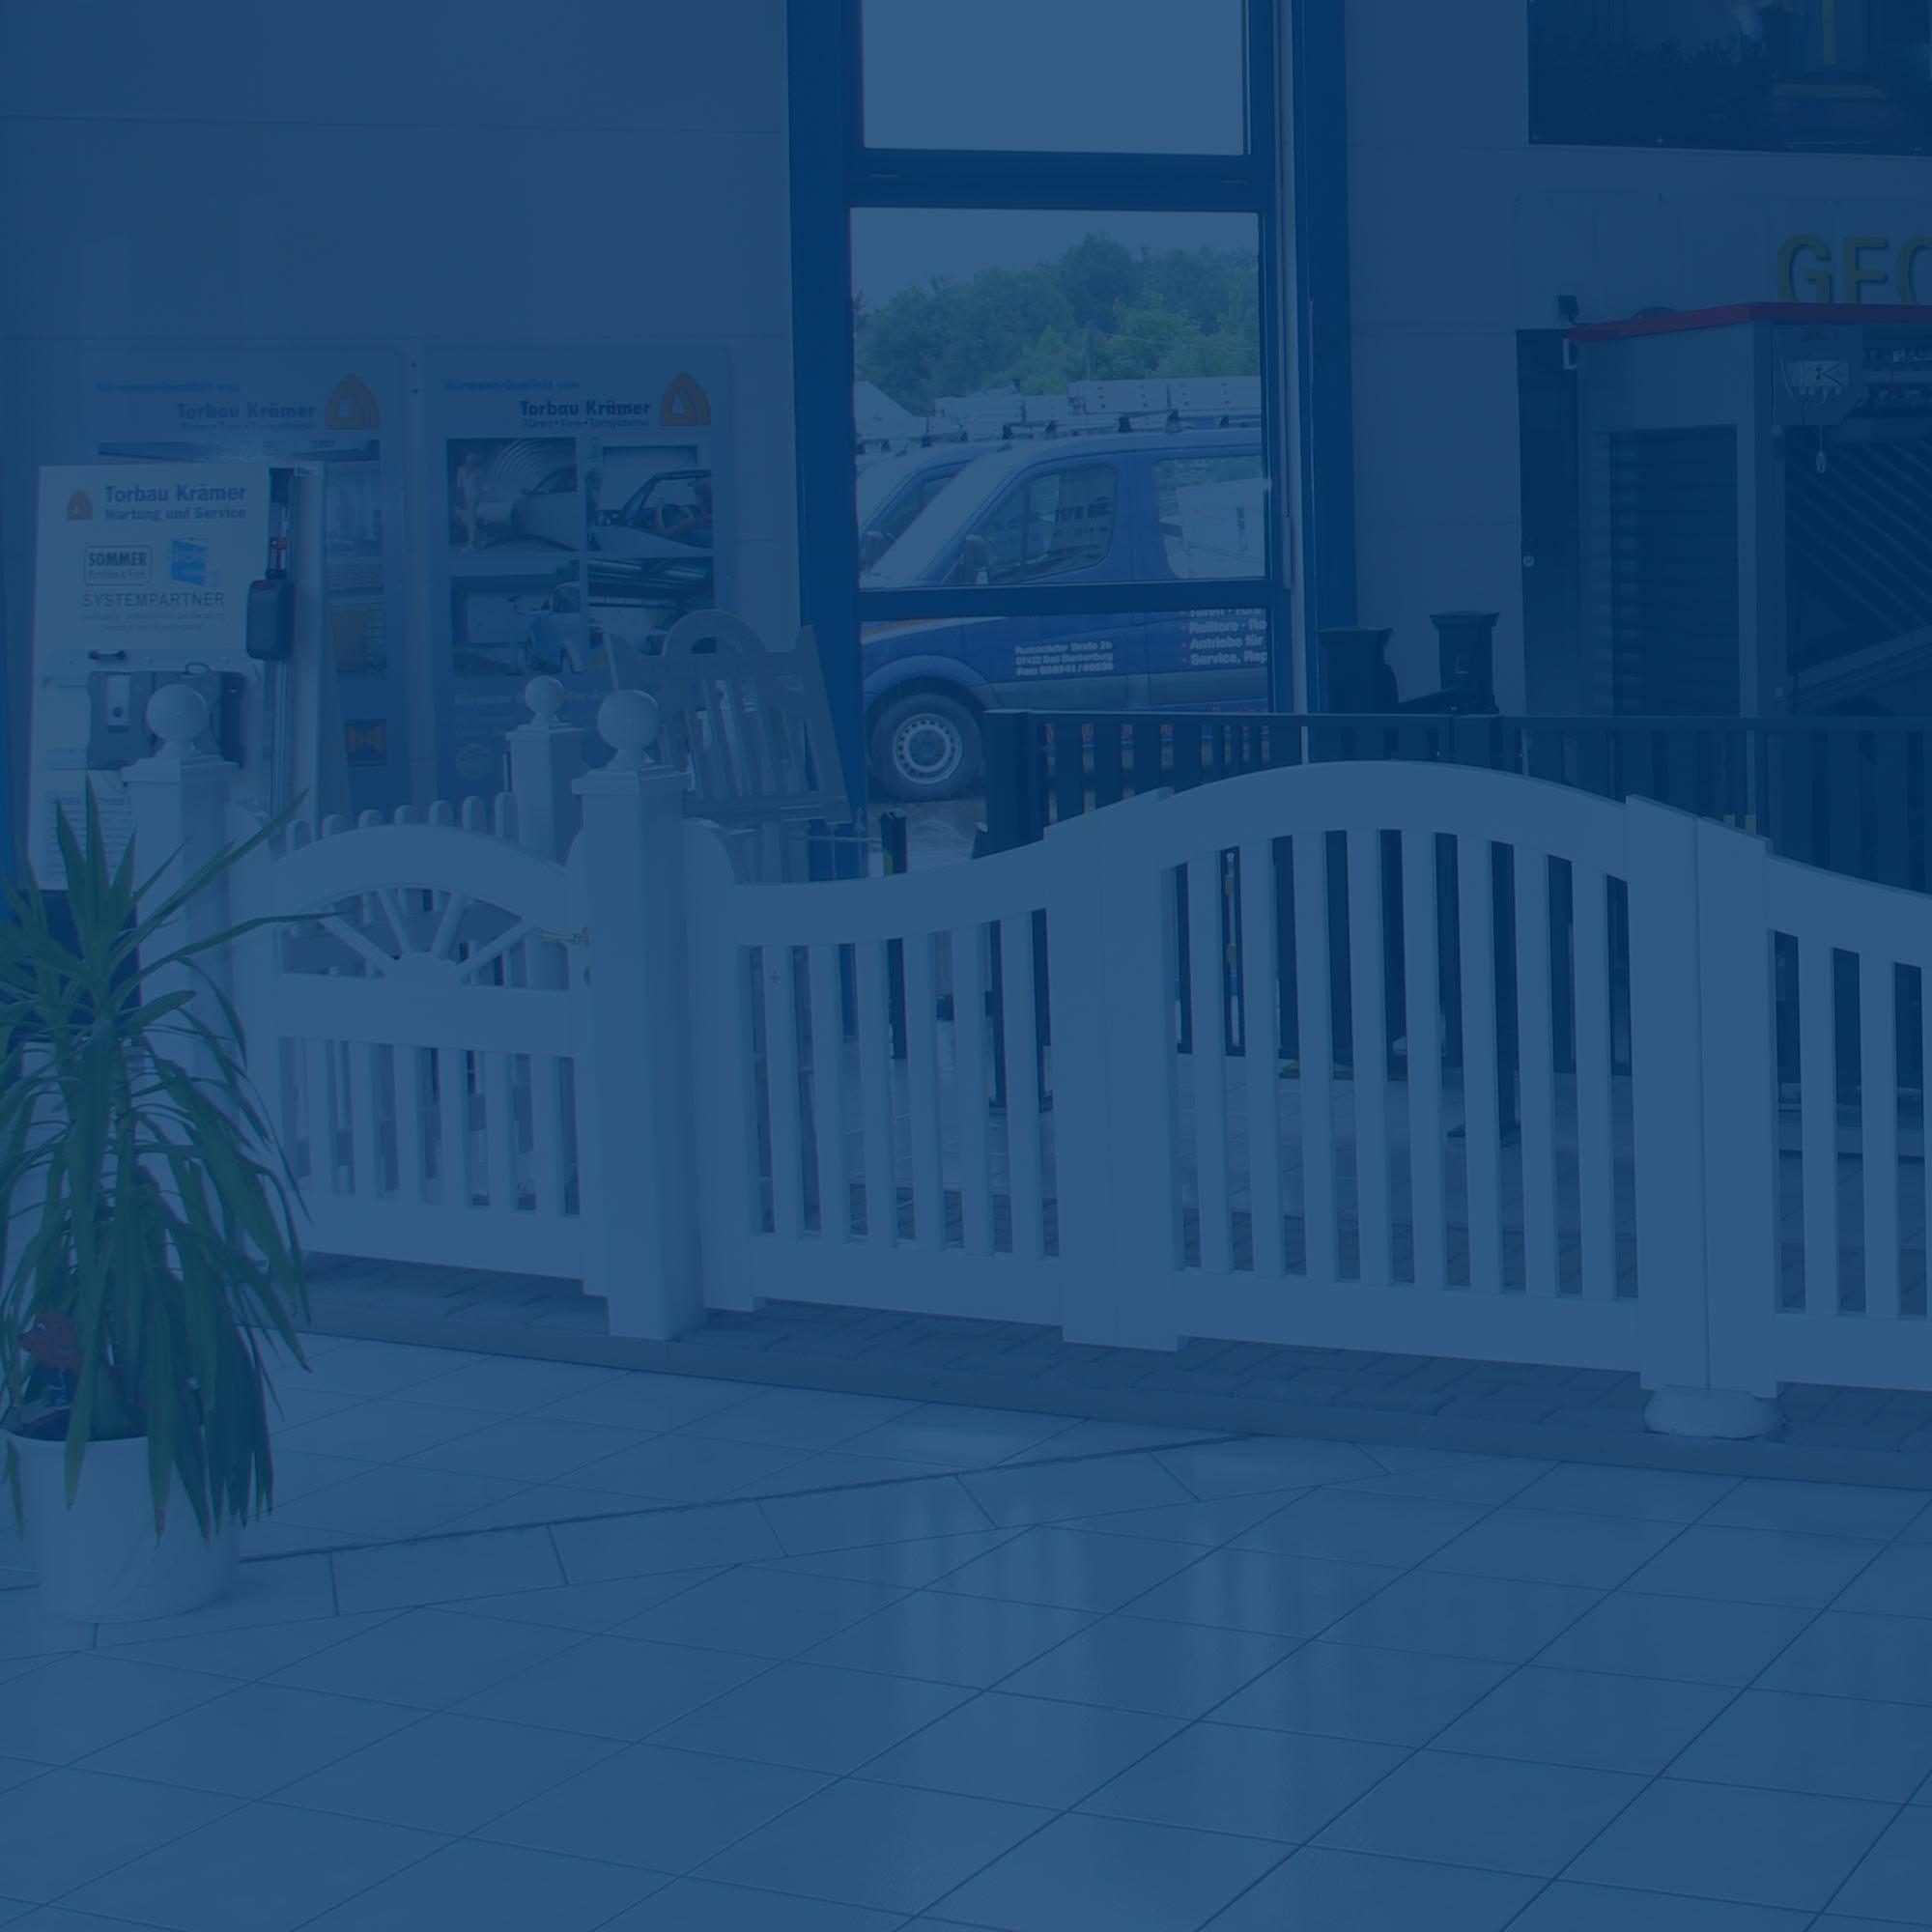 torbau kr mer in bad blankenburg th ringen tore antriebe wartung service. Black Bedroom Furniture Sets. Home Design Ideas